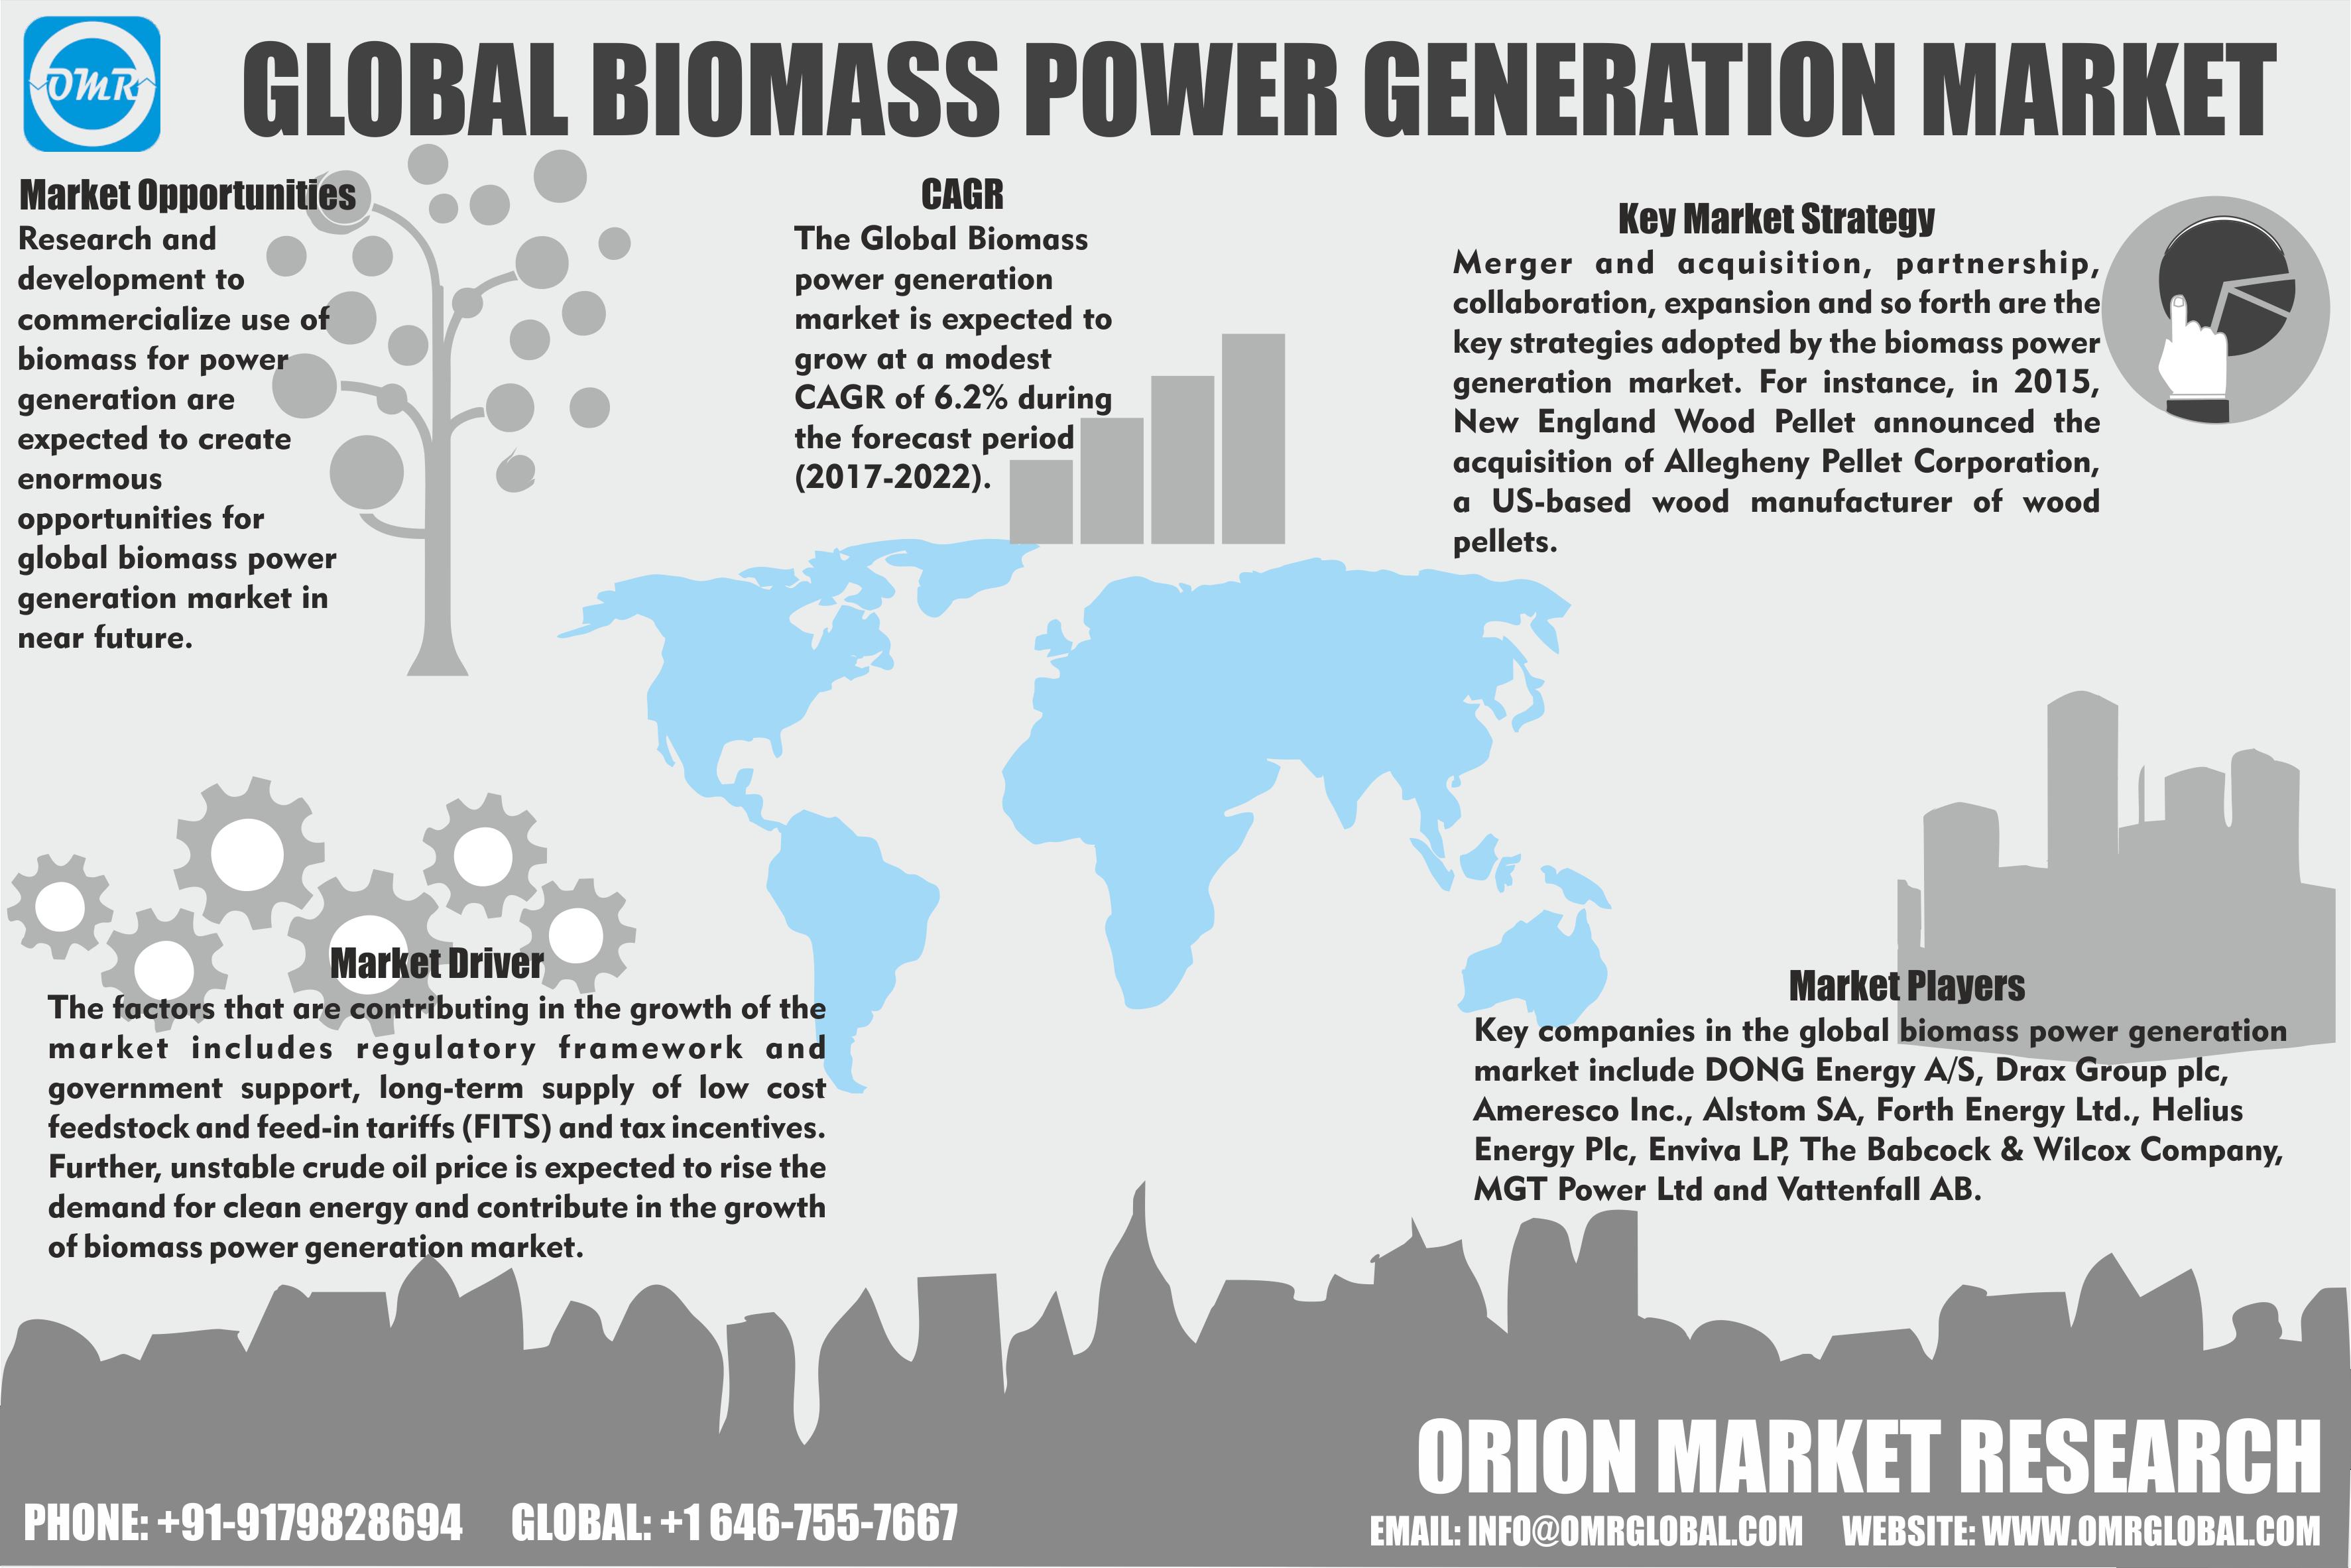 Biomass Power Generation Market Forecast To 2022 Marketing Trends Biomass Generation